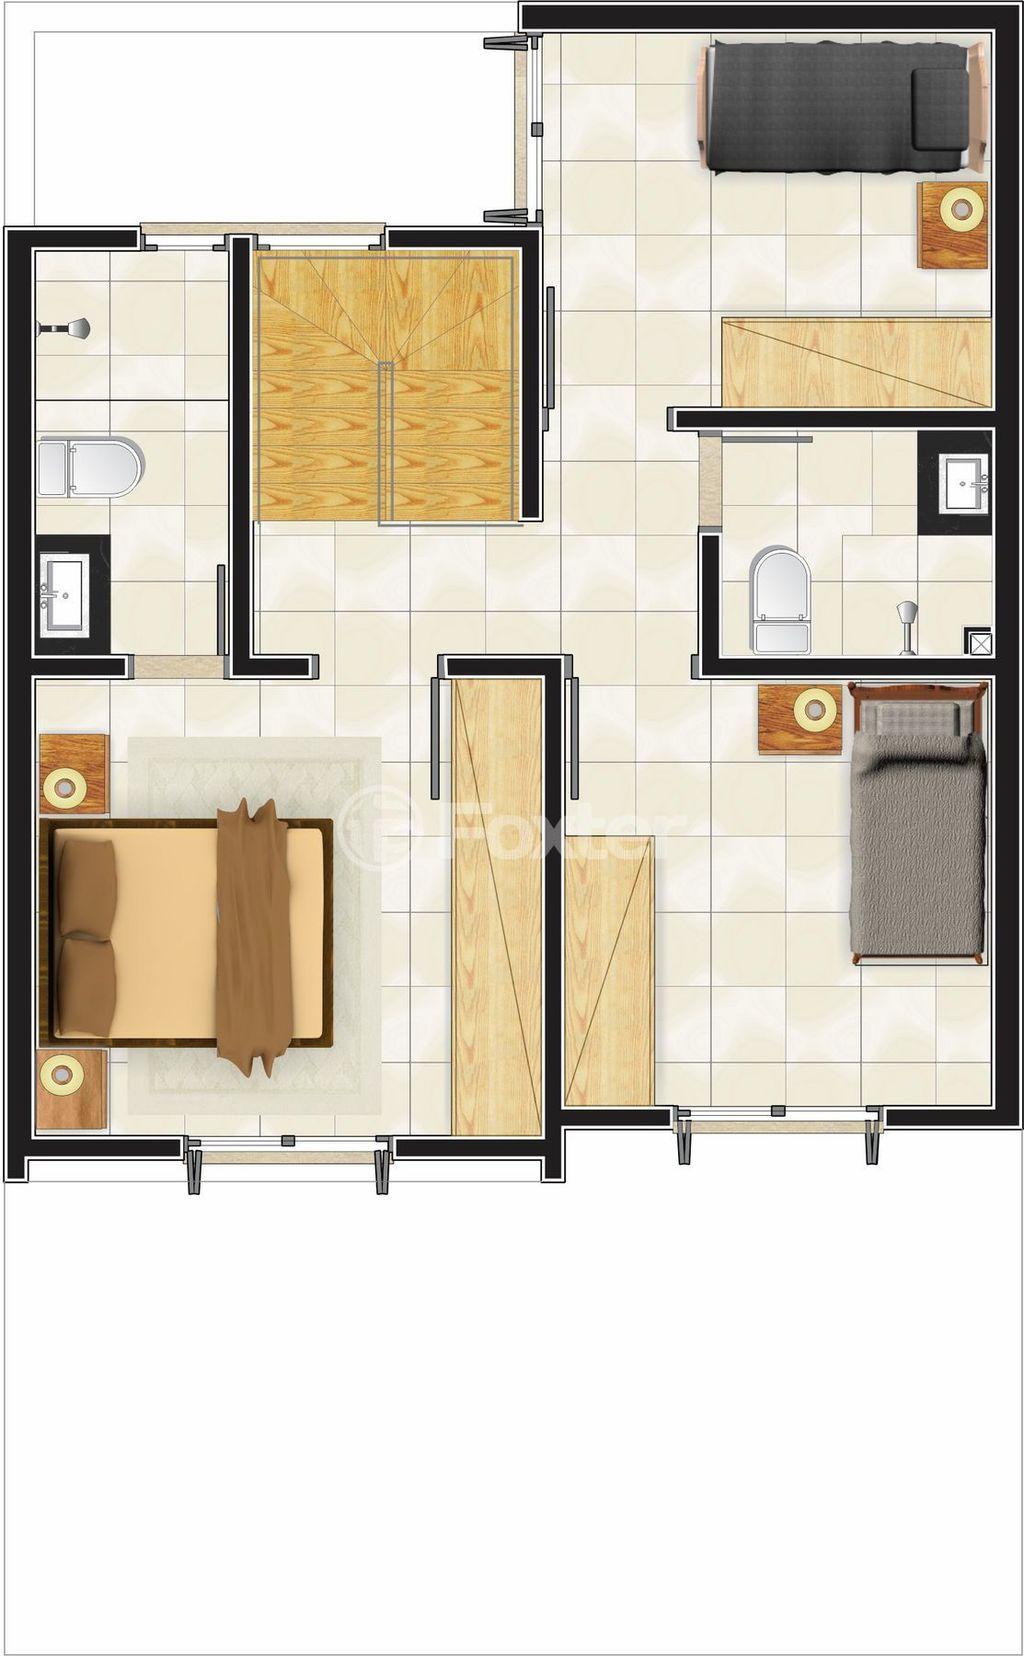 Casa 3 Dorm, Protásio Alves, Porto Alegre (131570) - Foto 3